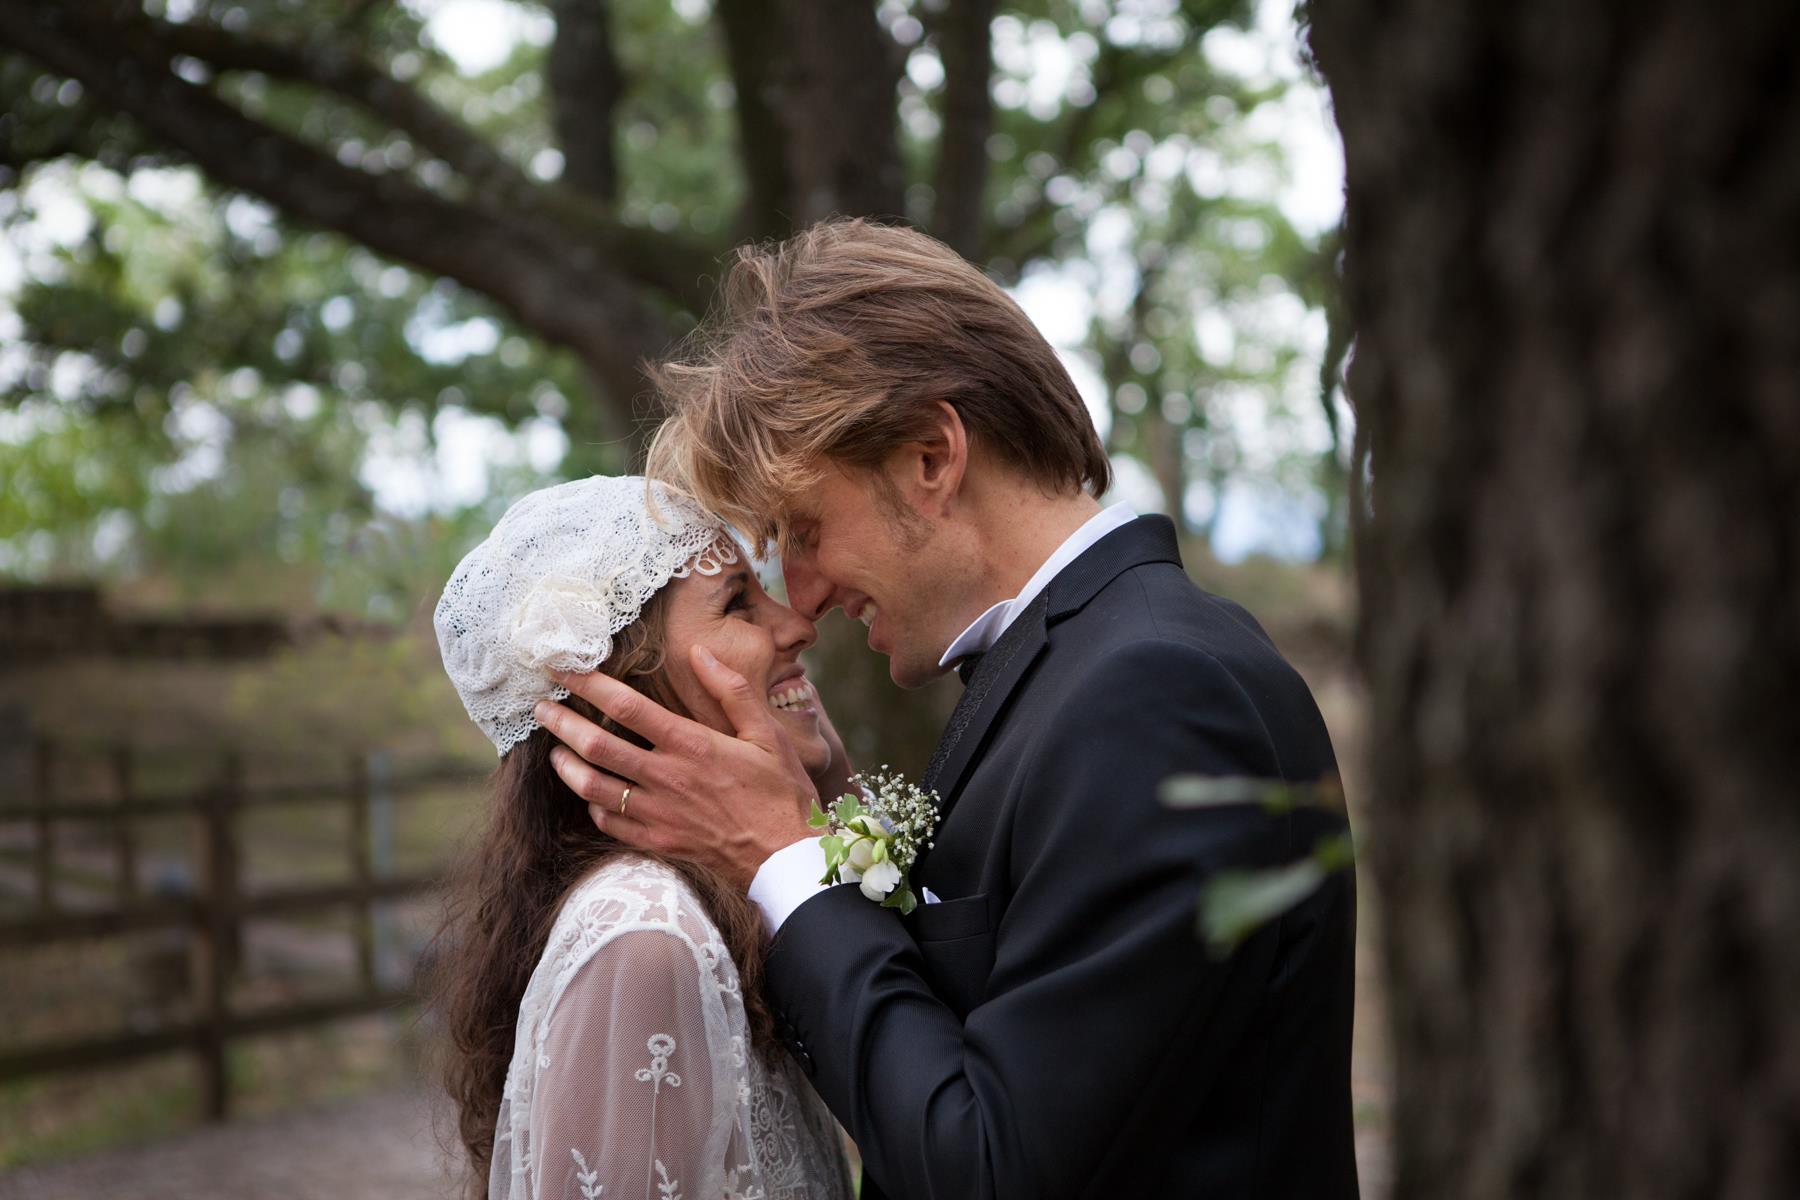 wedding-photo-reportage-matrimonio-scattidamore